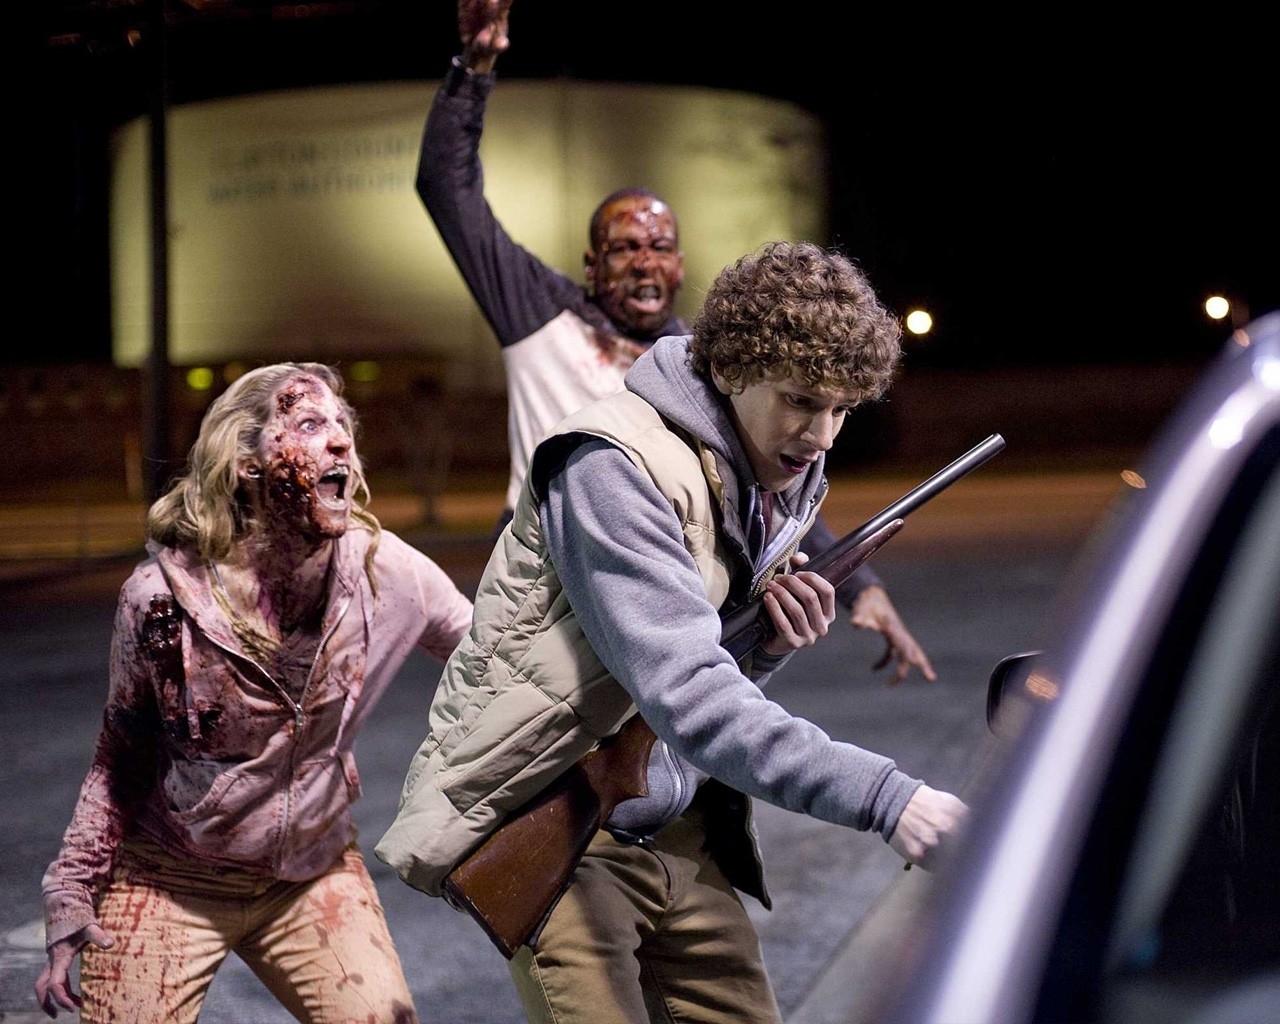 Columbus-The-Zombies-zombieland-20358616-1280-1024.jpg